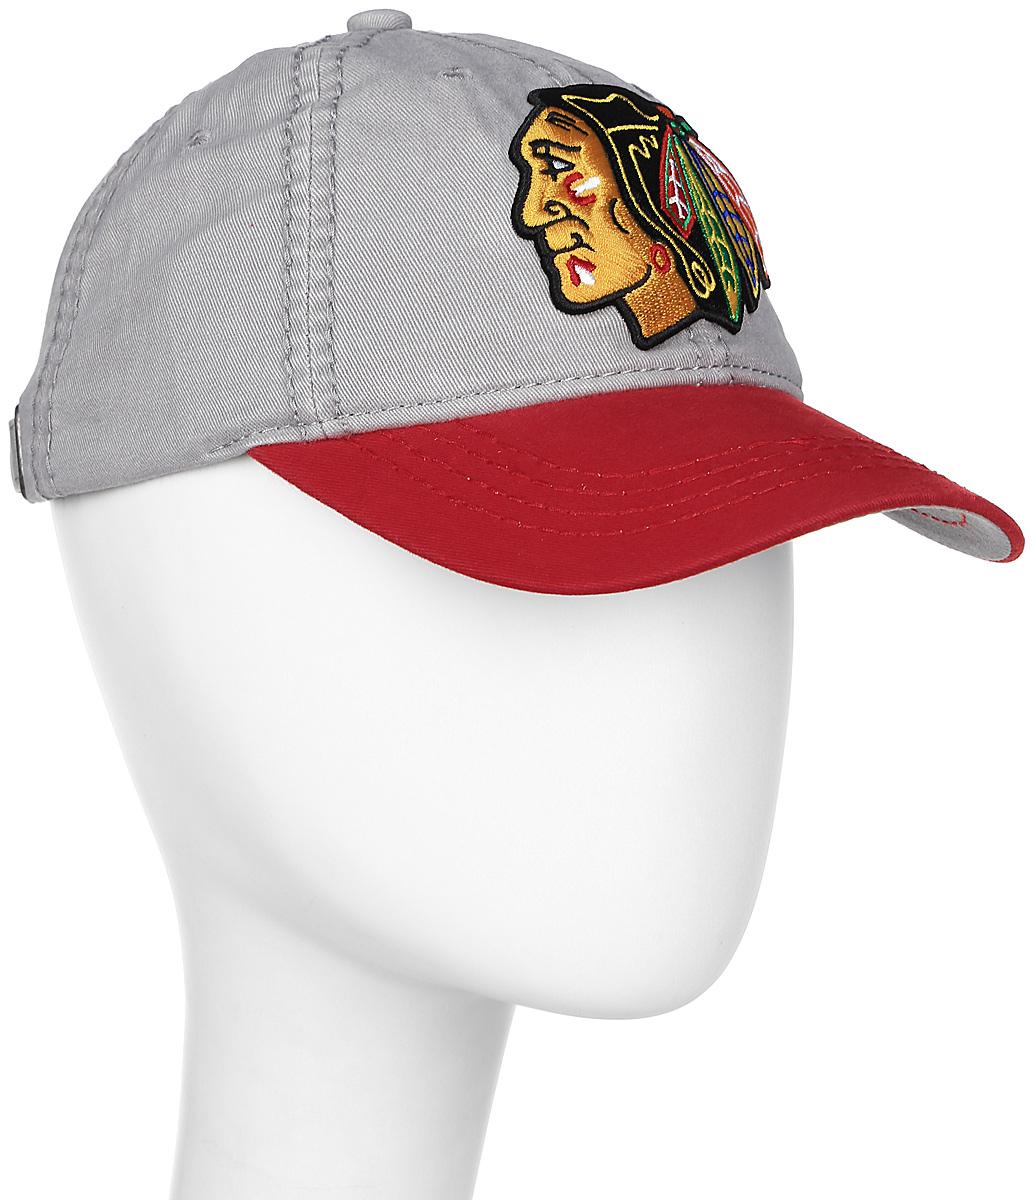 Бейсболка NHL Chicago Blackhawks, цвет: серый, красный. 2906. Размер L/XL (55-58) 2015 chicago blackhawks nhl stanley cup western conference champions hockey puck sherwood